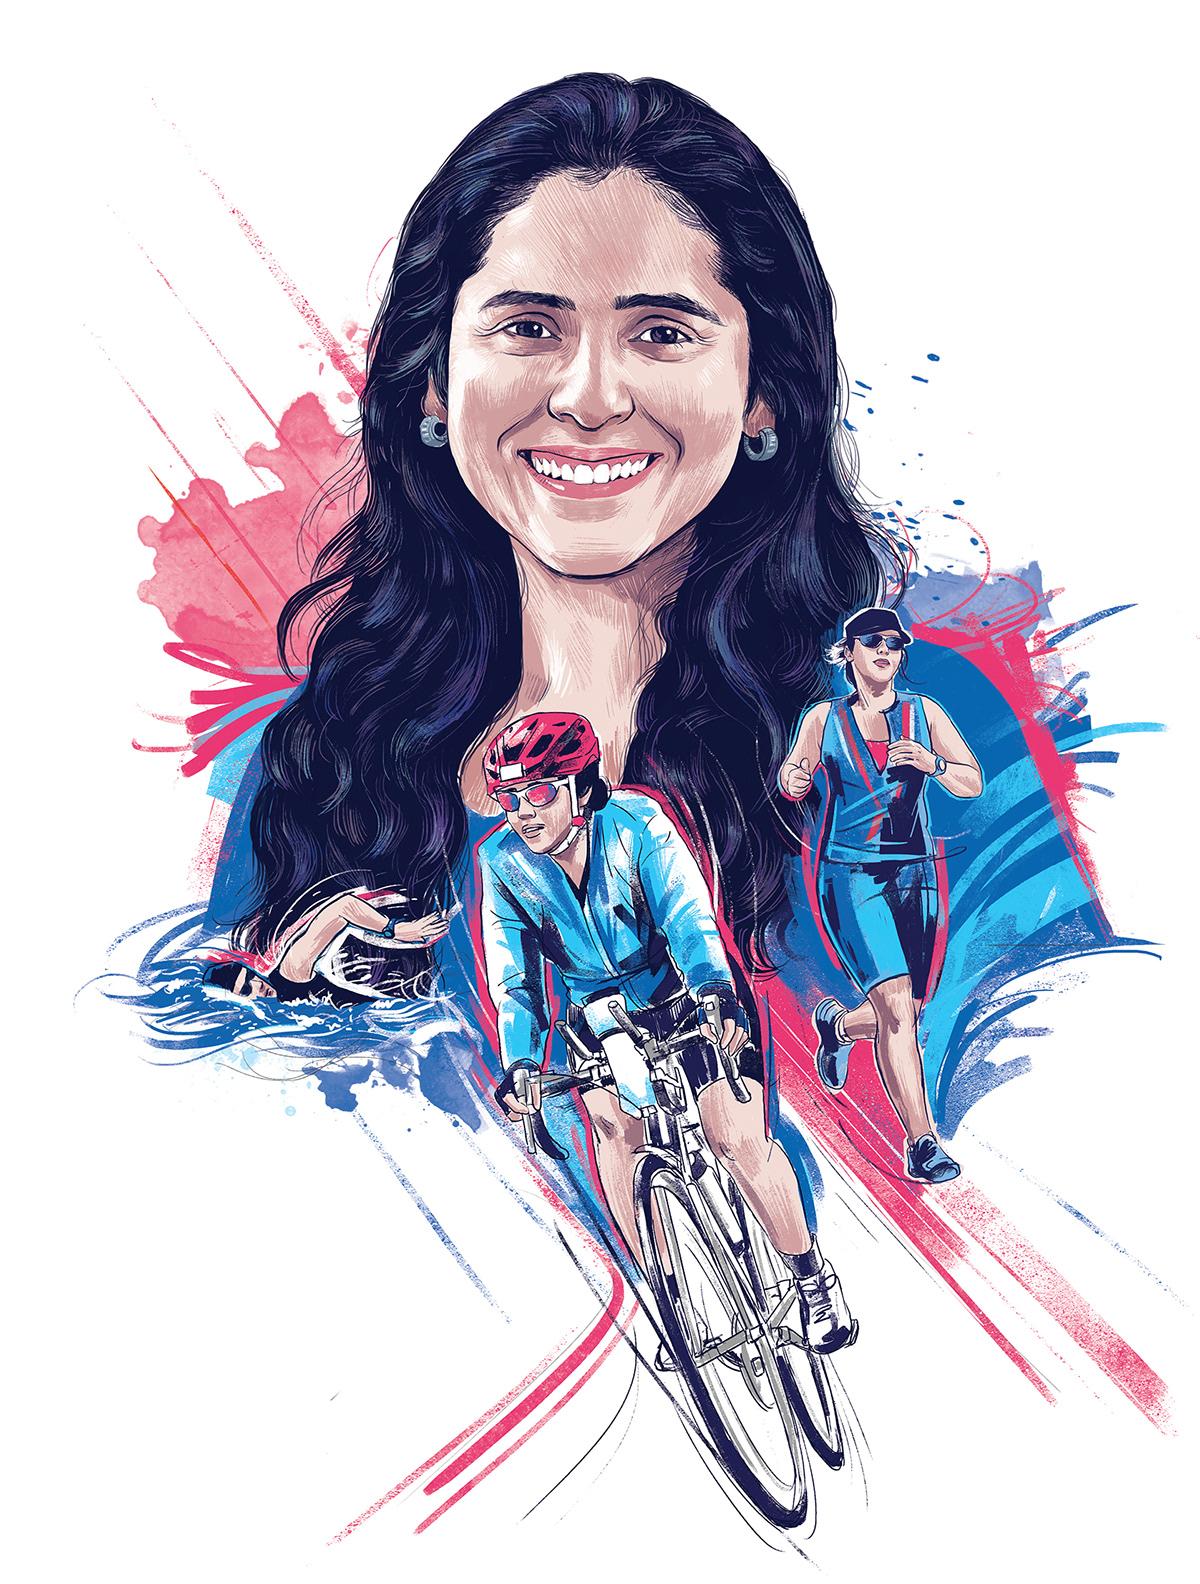 art Digital Art  Drawing  Editorial Illustration ILLUSTRATION  magazine art portrait sports portrait women power